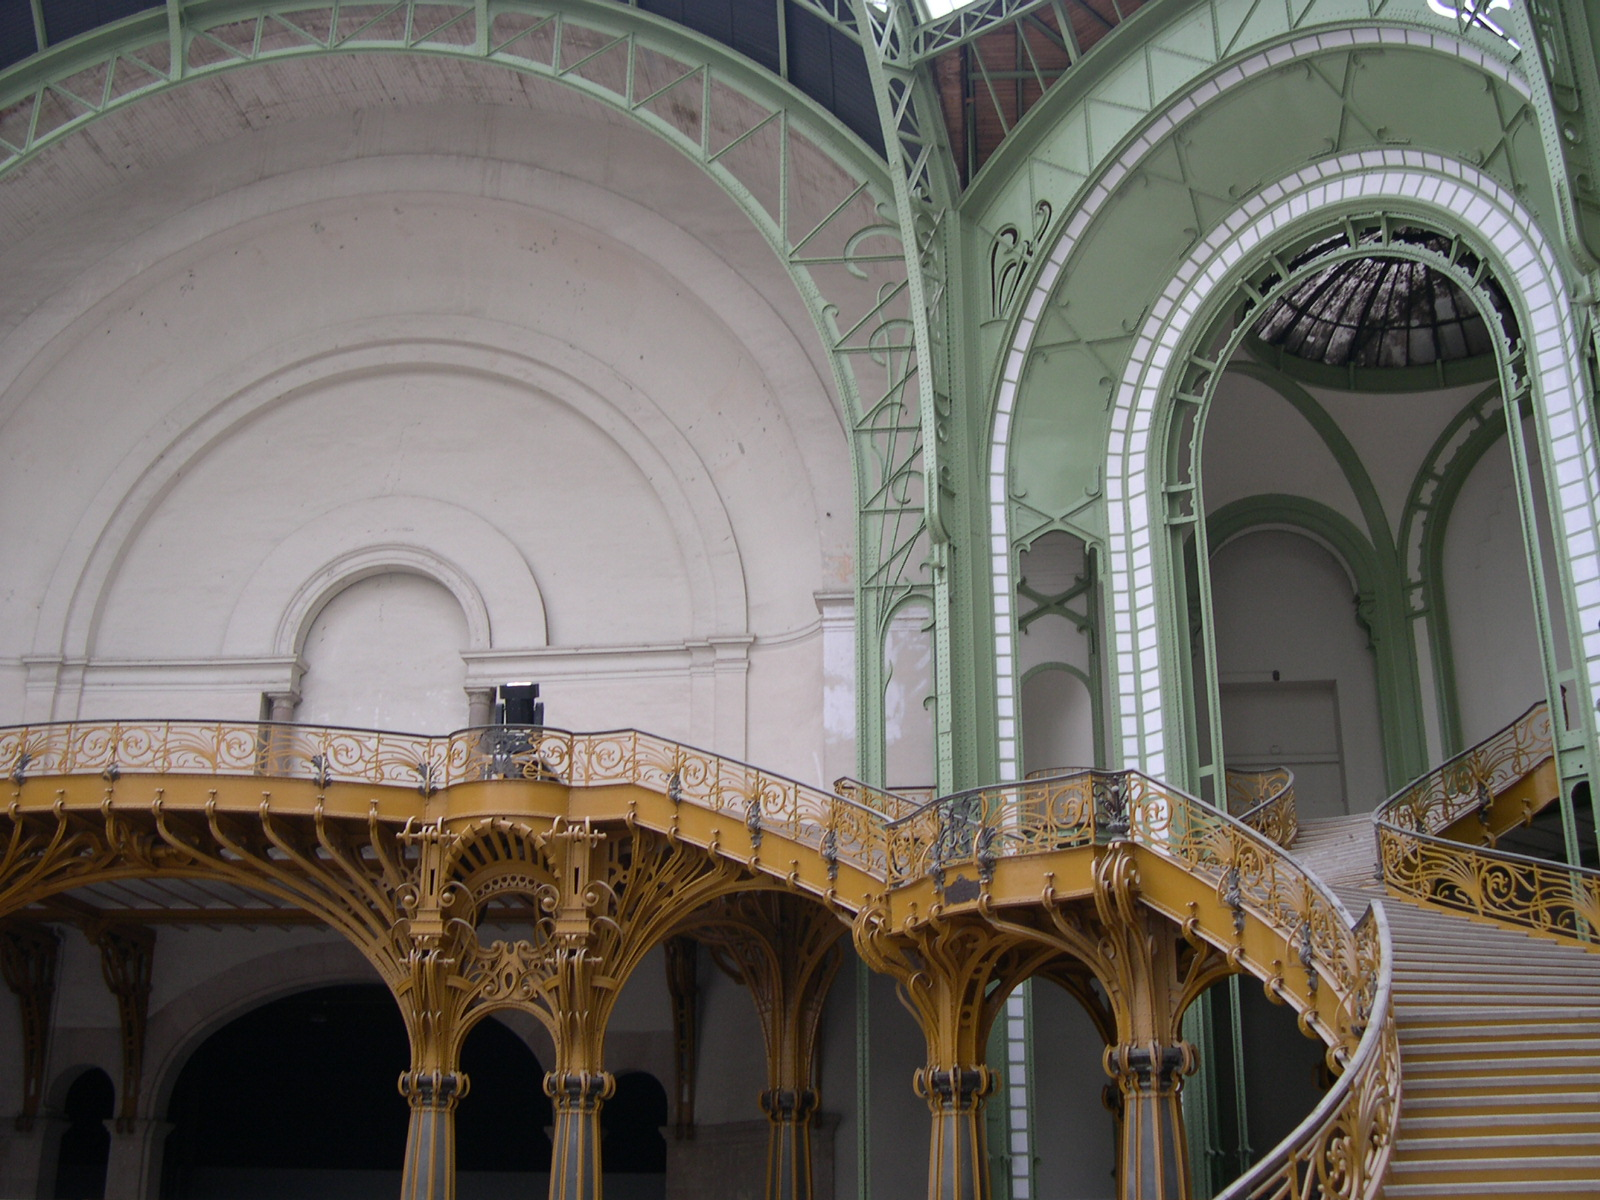 grand palais paris september 2005 l 39 escalier monumental du grand palais. Black Bedroom Furniture Sets. Home Design Ideas